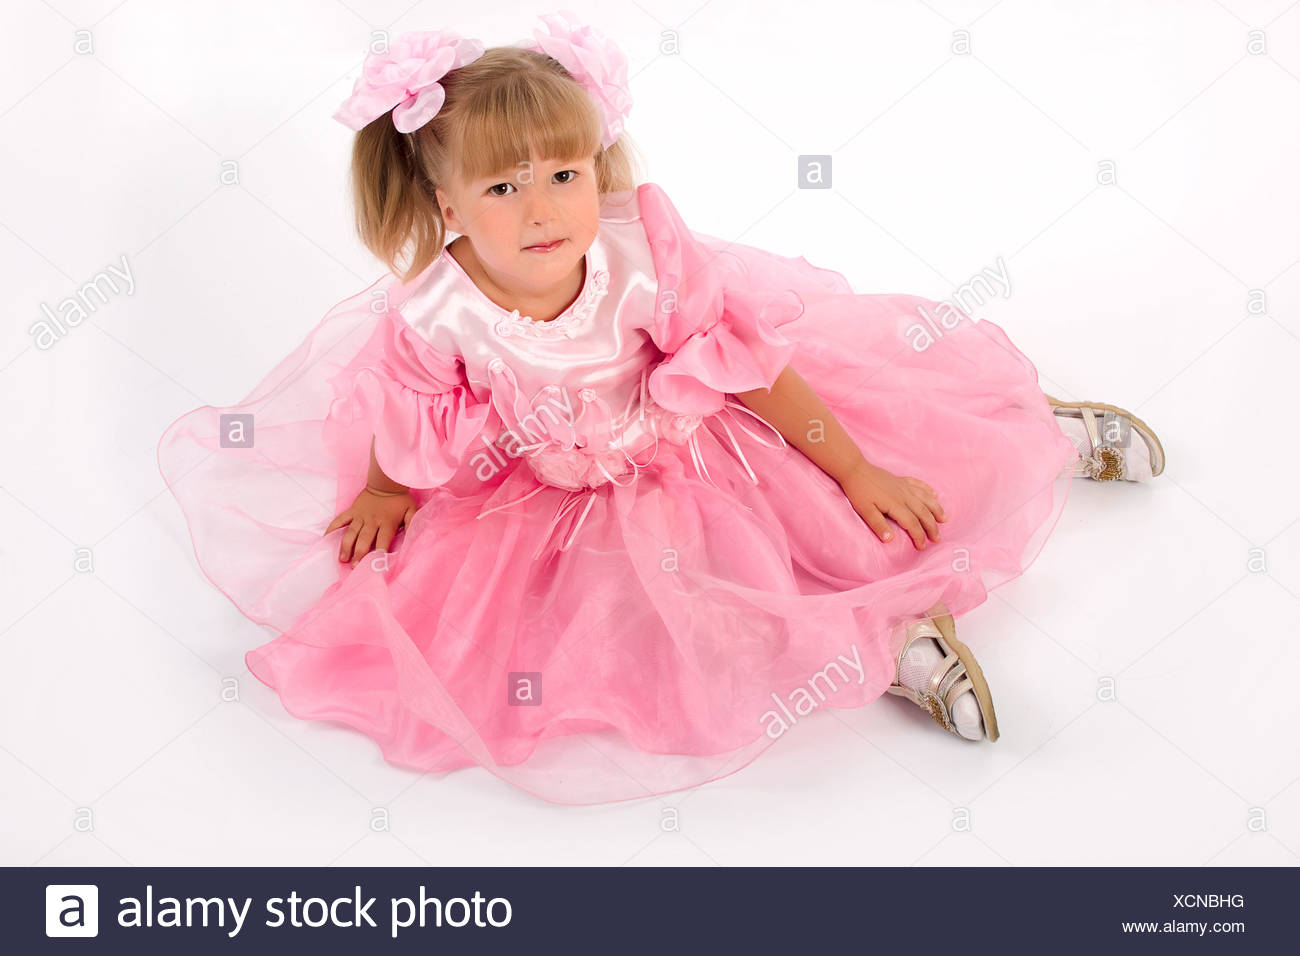 Pink Silk Dress Imágenes De Stock & Pink Silk Dress Fotos De Stock ...